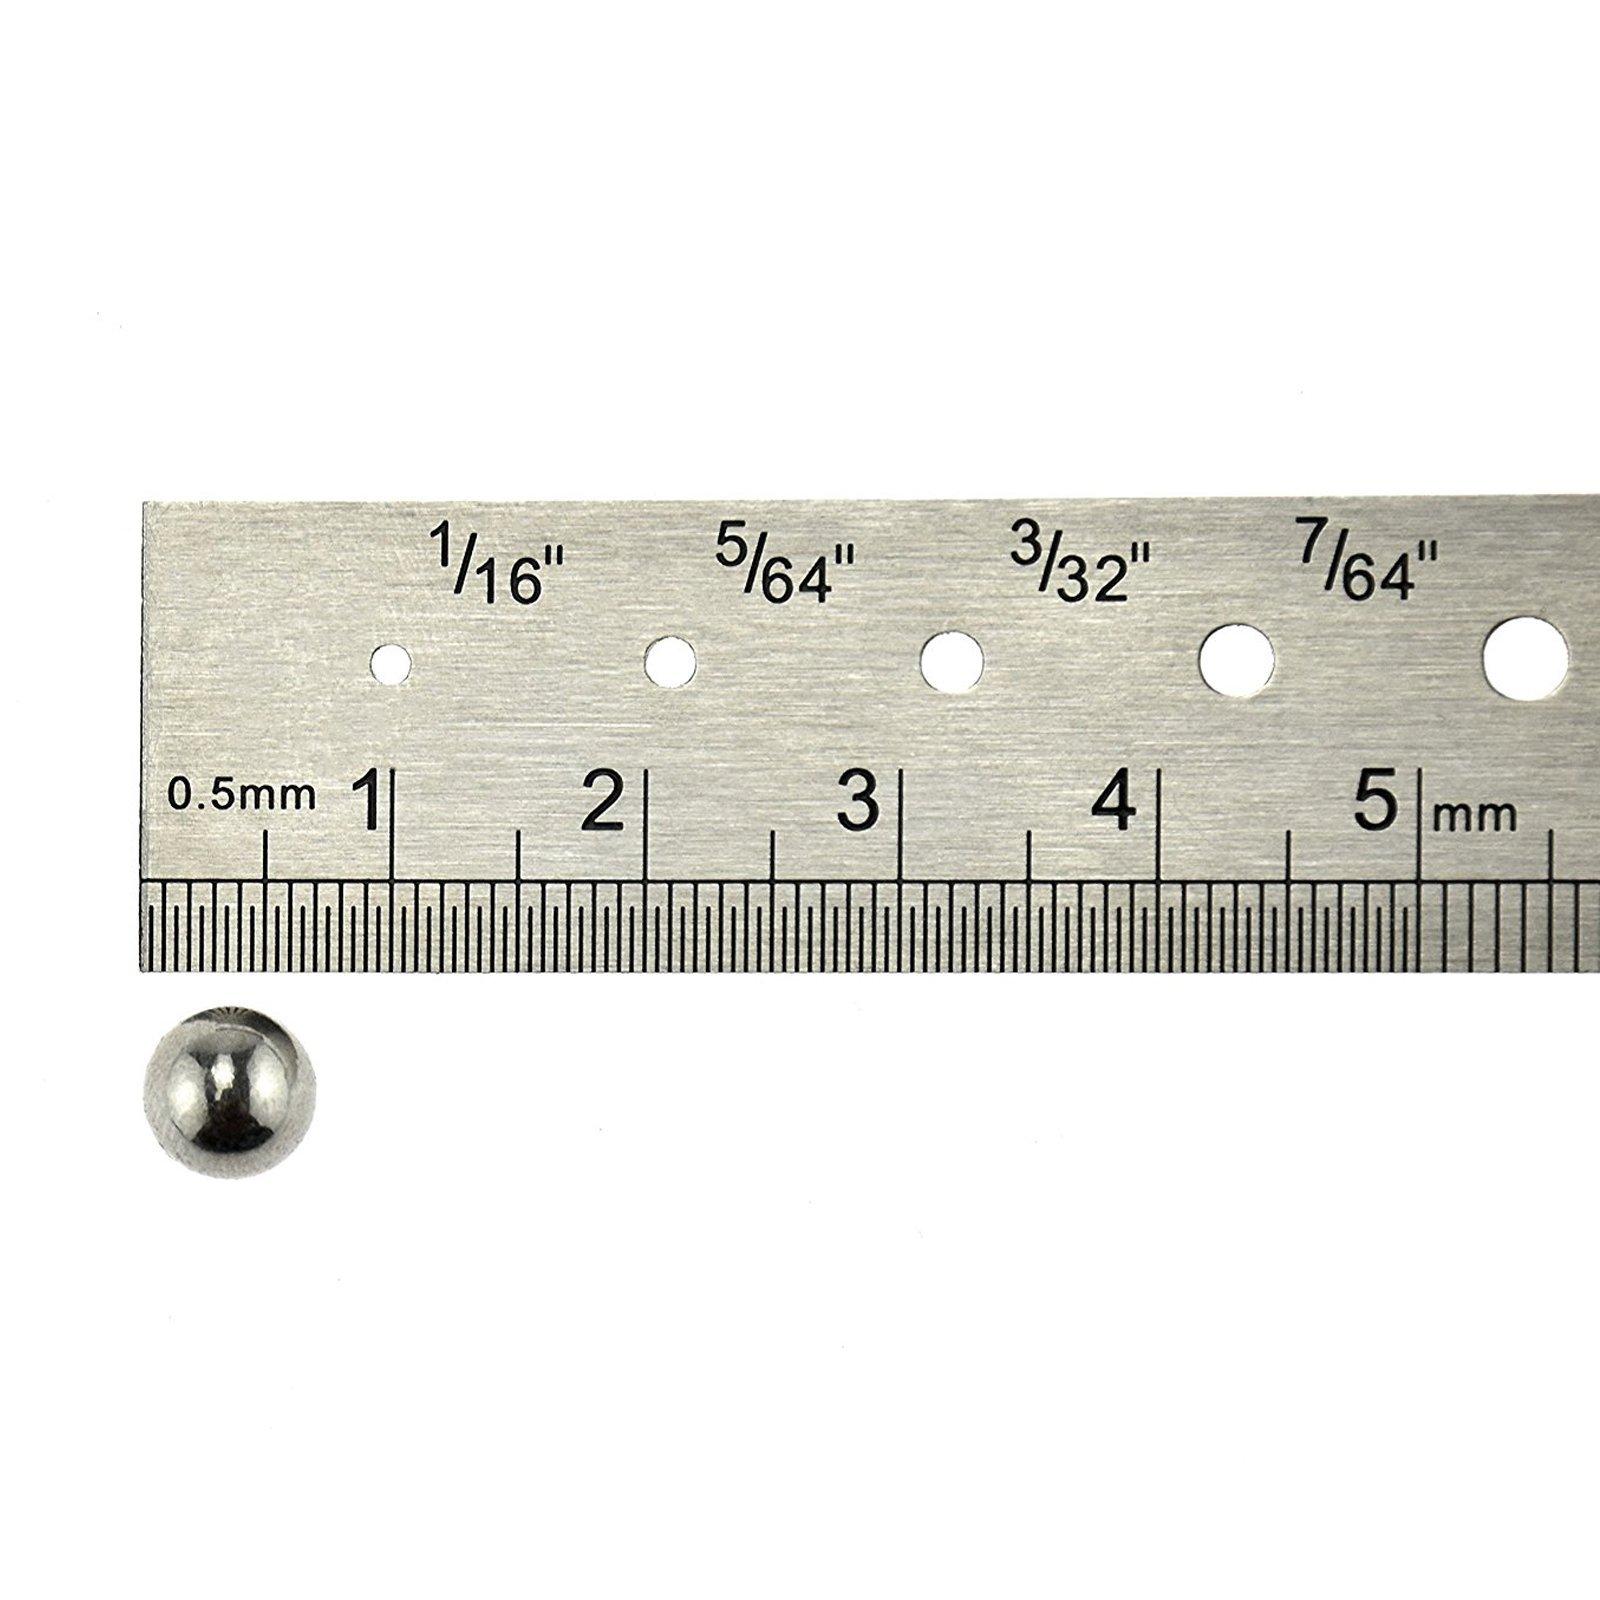 ASR Outdoor 8mm Sling Shot Ball Bearings Steel 50 Piece Set